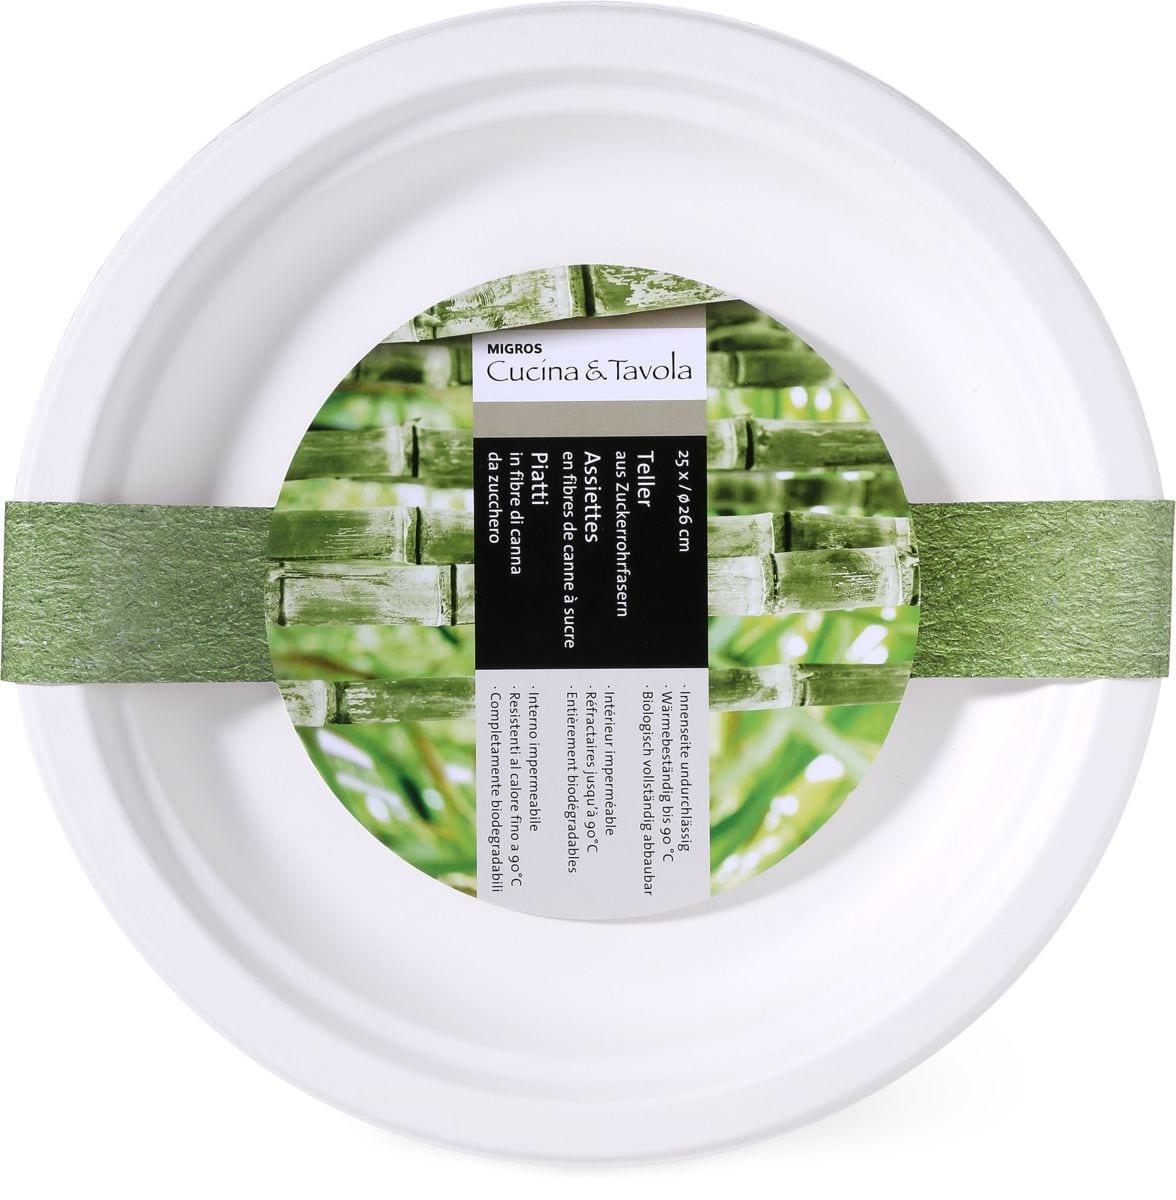 Cucina & Tavola Piatti